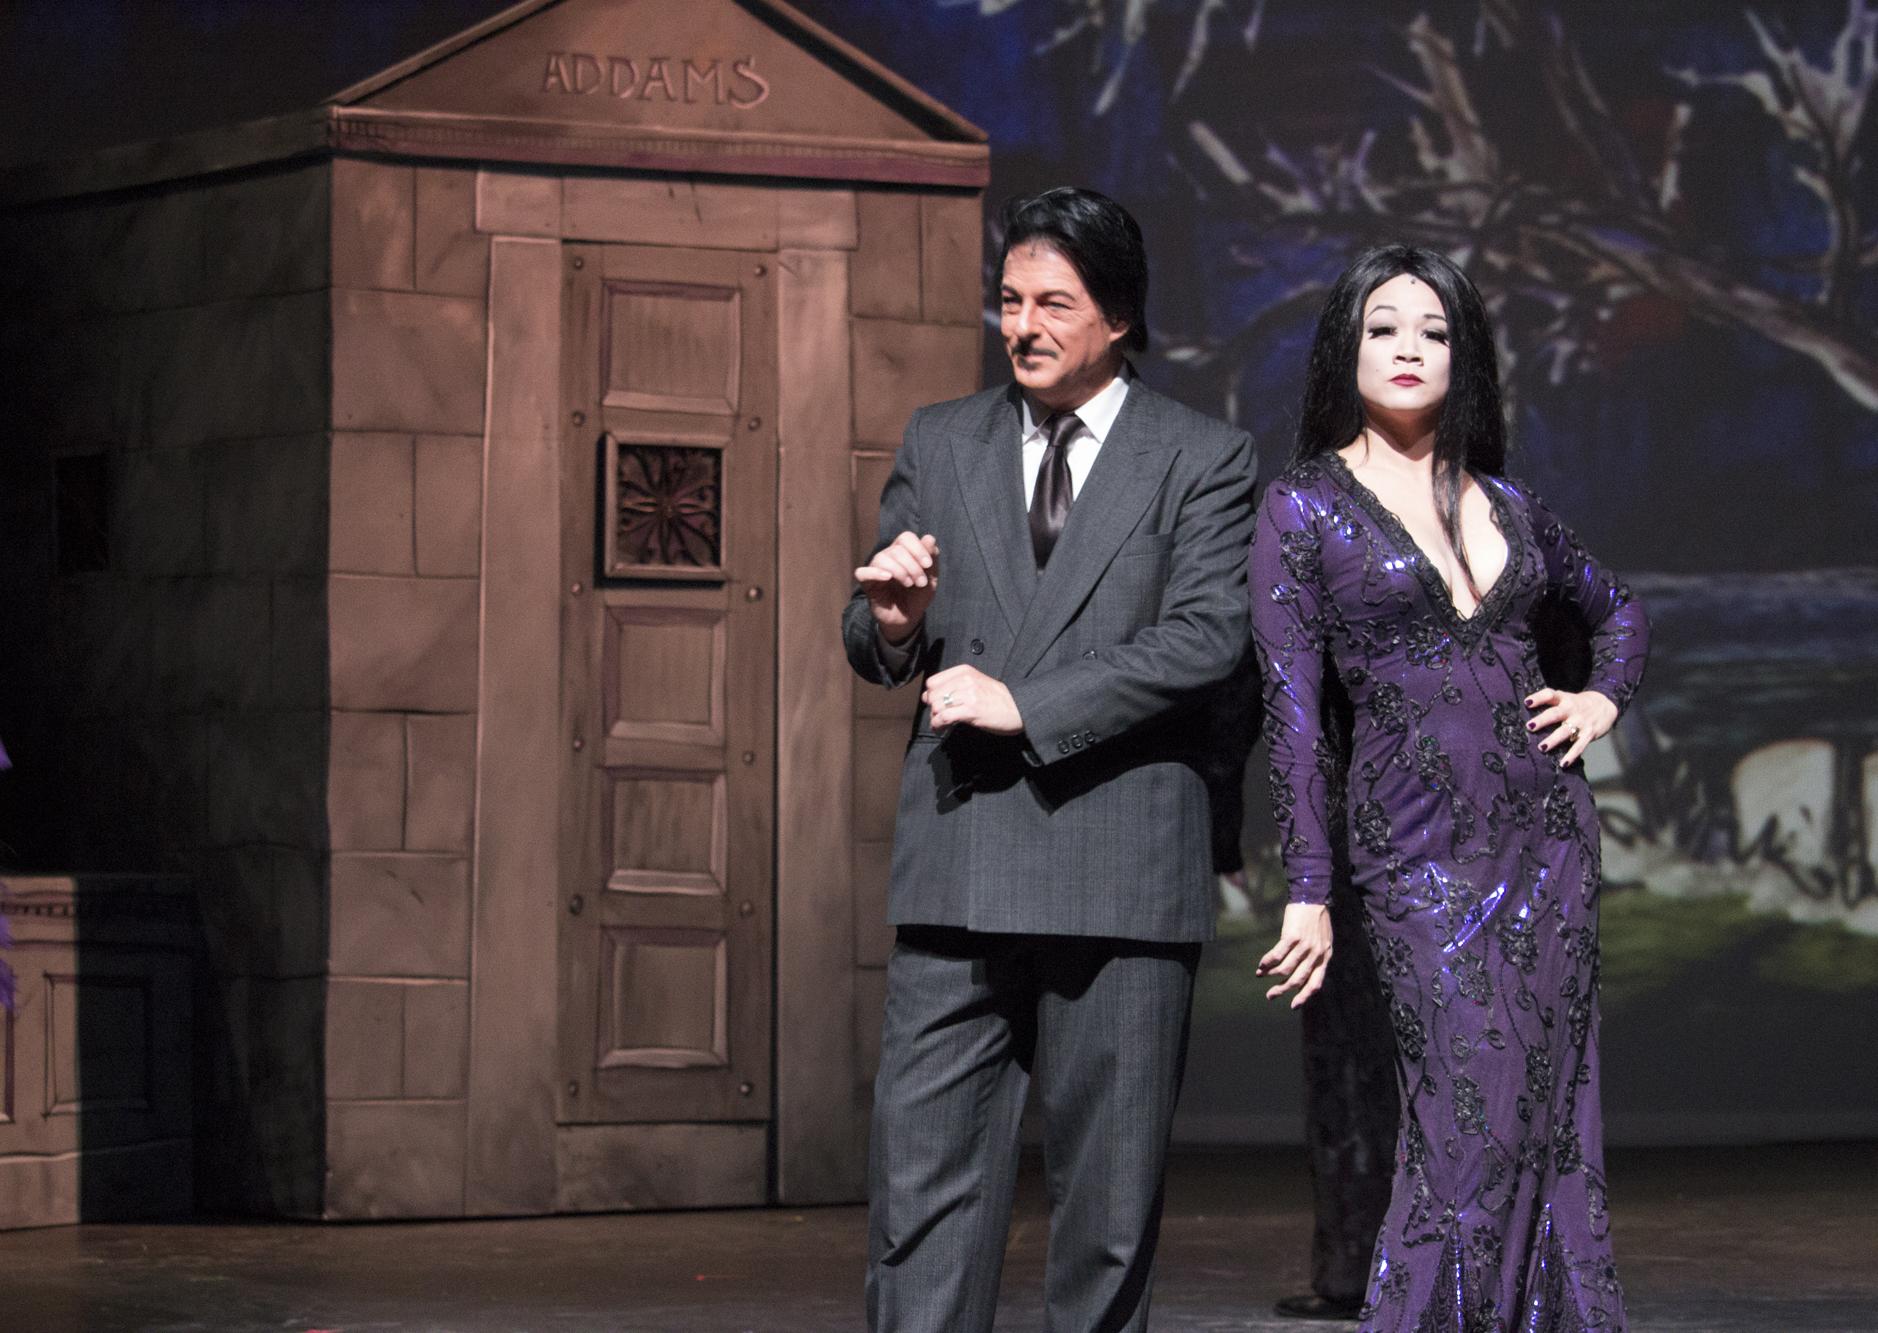 MainStage Irving Las Colinas_The Addams Family_Michael Robinson as Gomez Addams_Olivia de Guzman Emile as Morticia Addams_Photo by Travis J. Fant